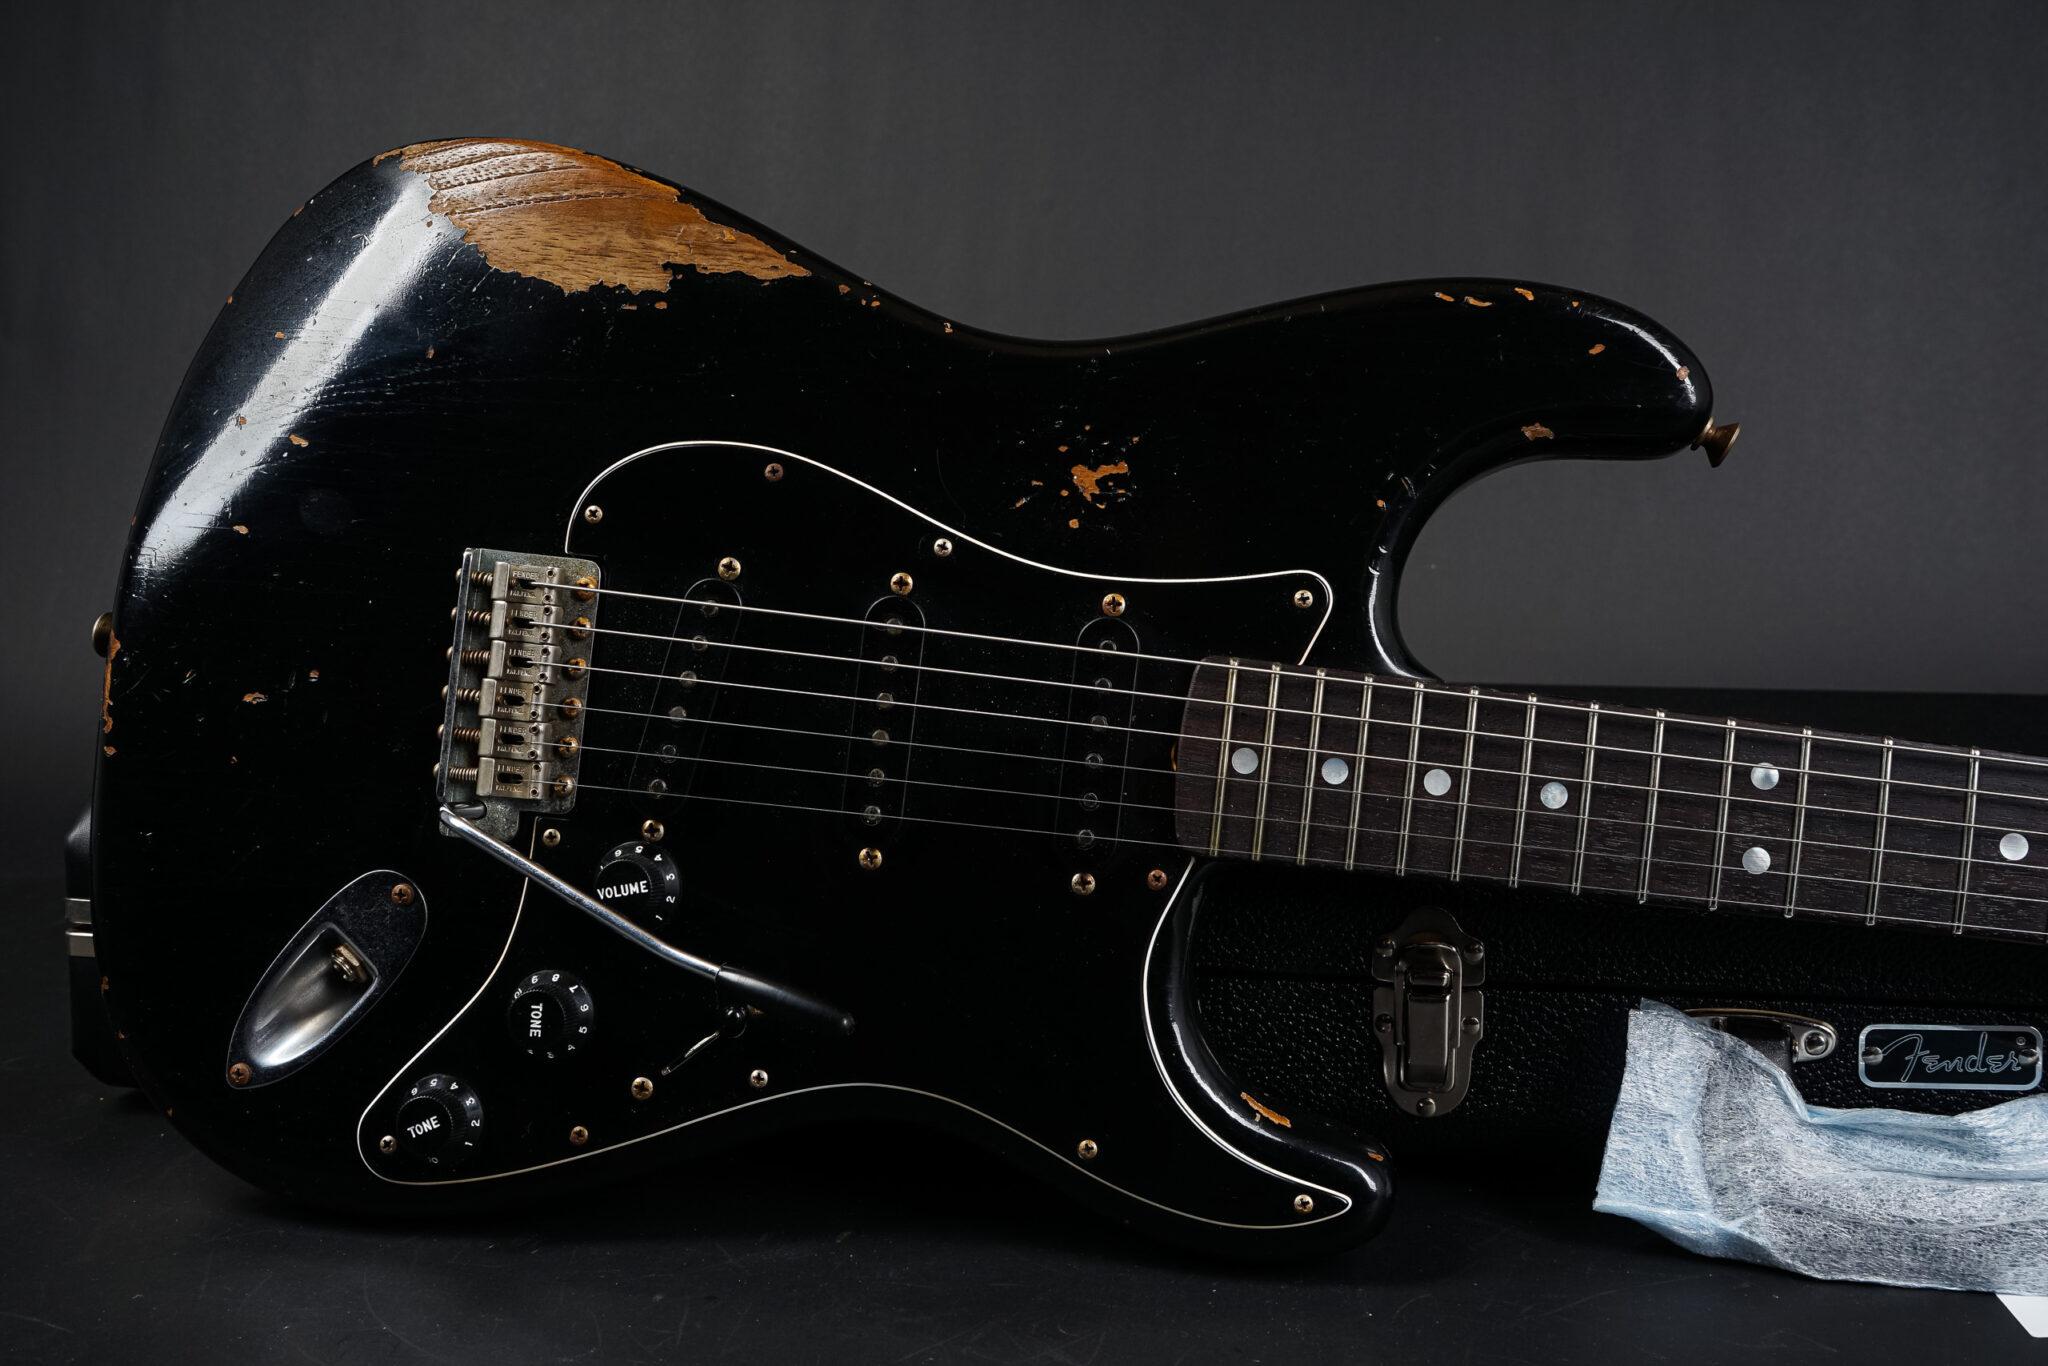 https://guitarpoint.de/app/uploads/products/2021-fender-carlos-lopez-masterbuilt-1967-stratocaster-black-cz551990/1967-Fender-Stratocaster-Black-MBCL-9-2048x1366.jpg